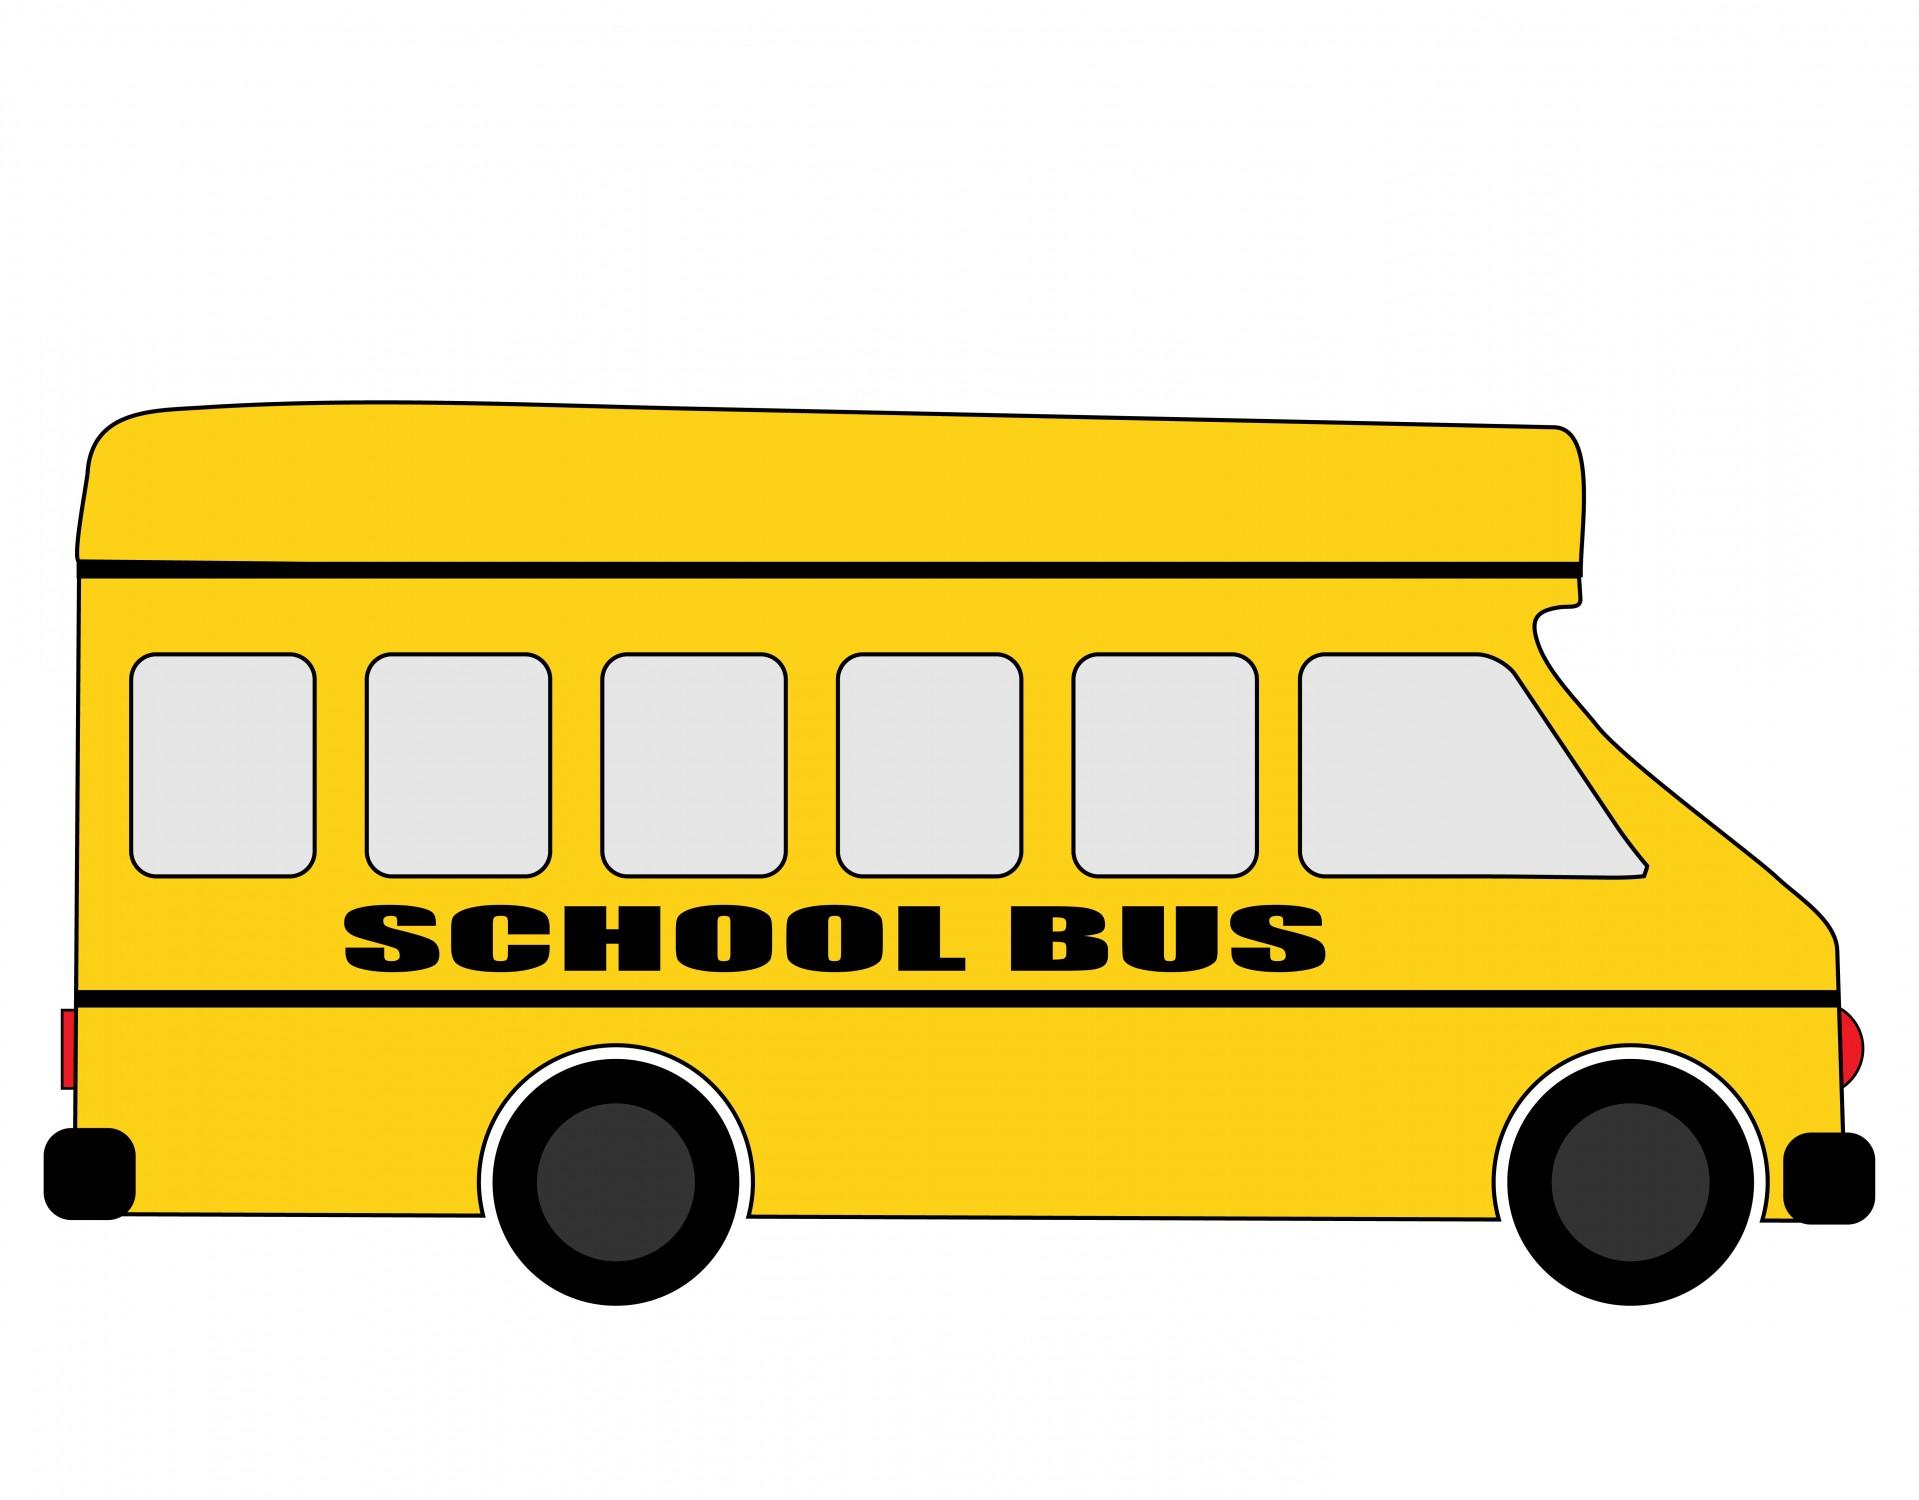 Cute school bus clip art free clipart images 2.